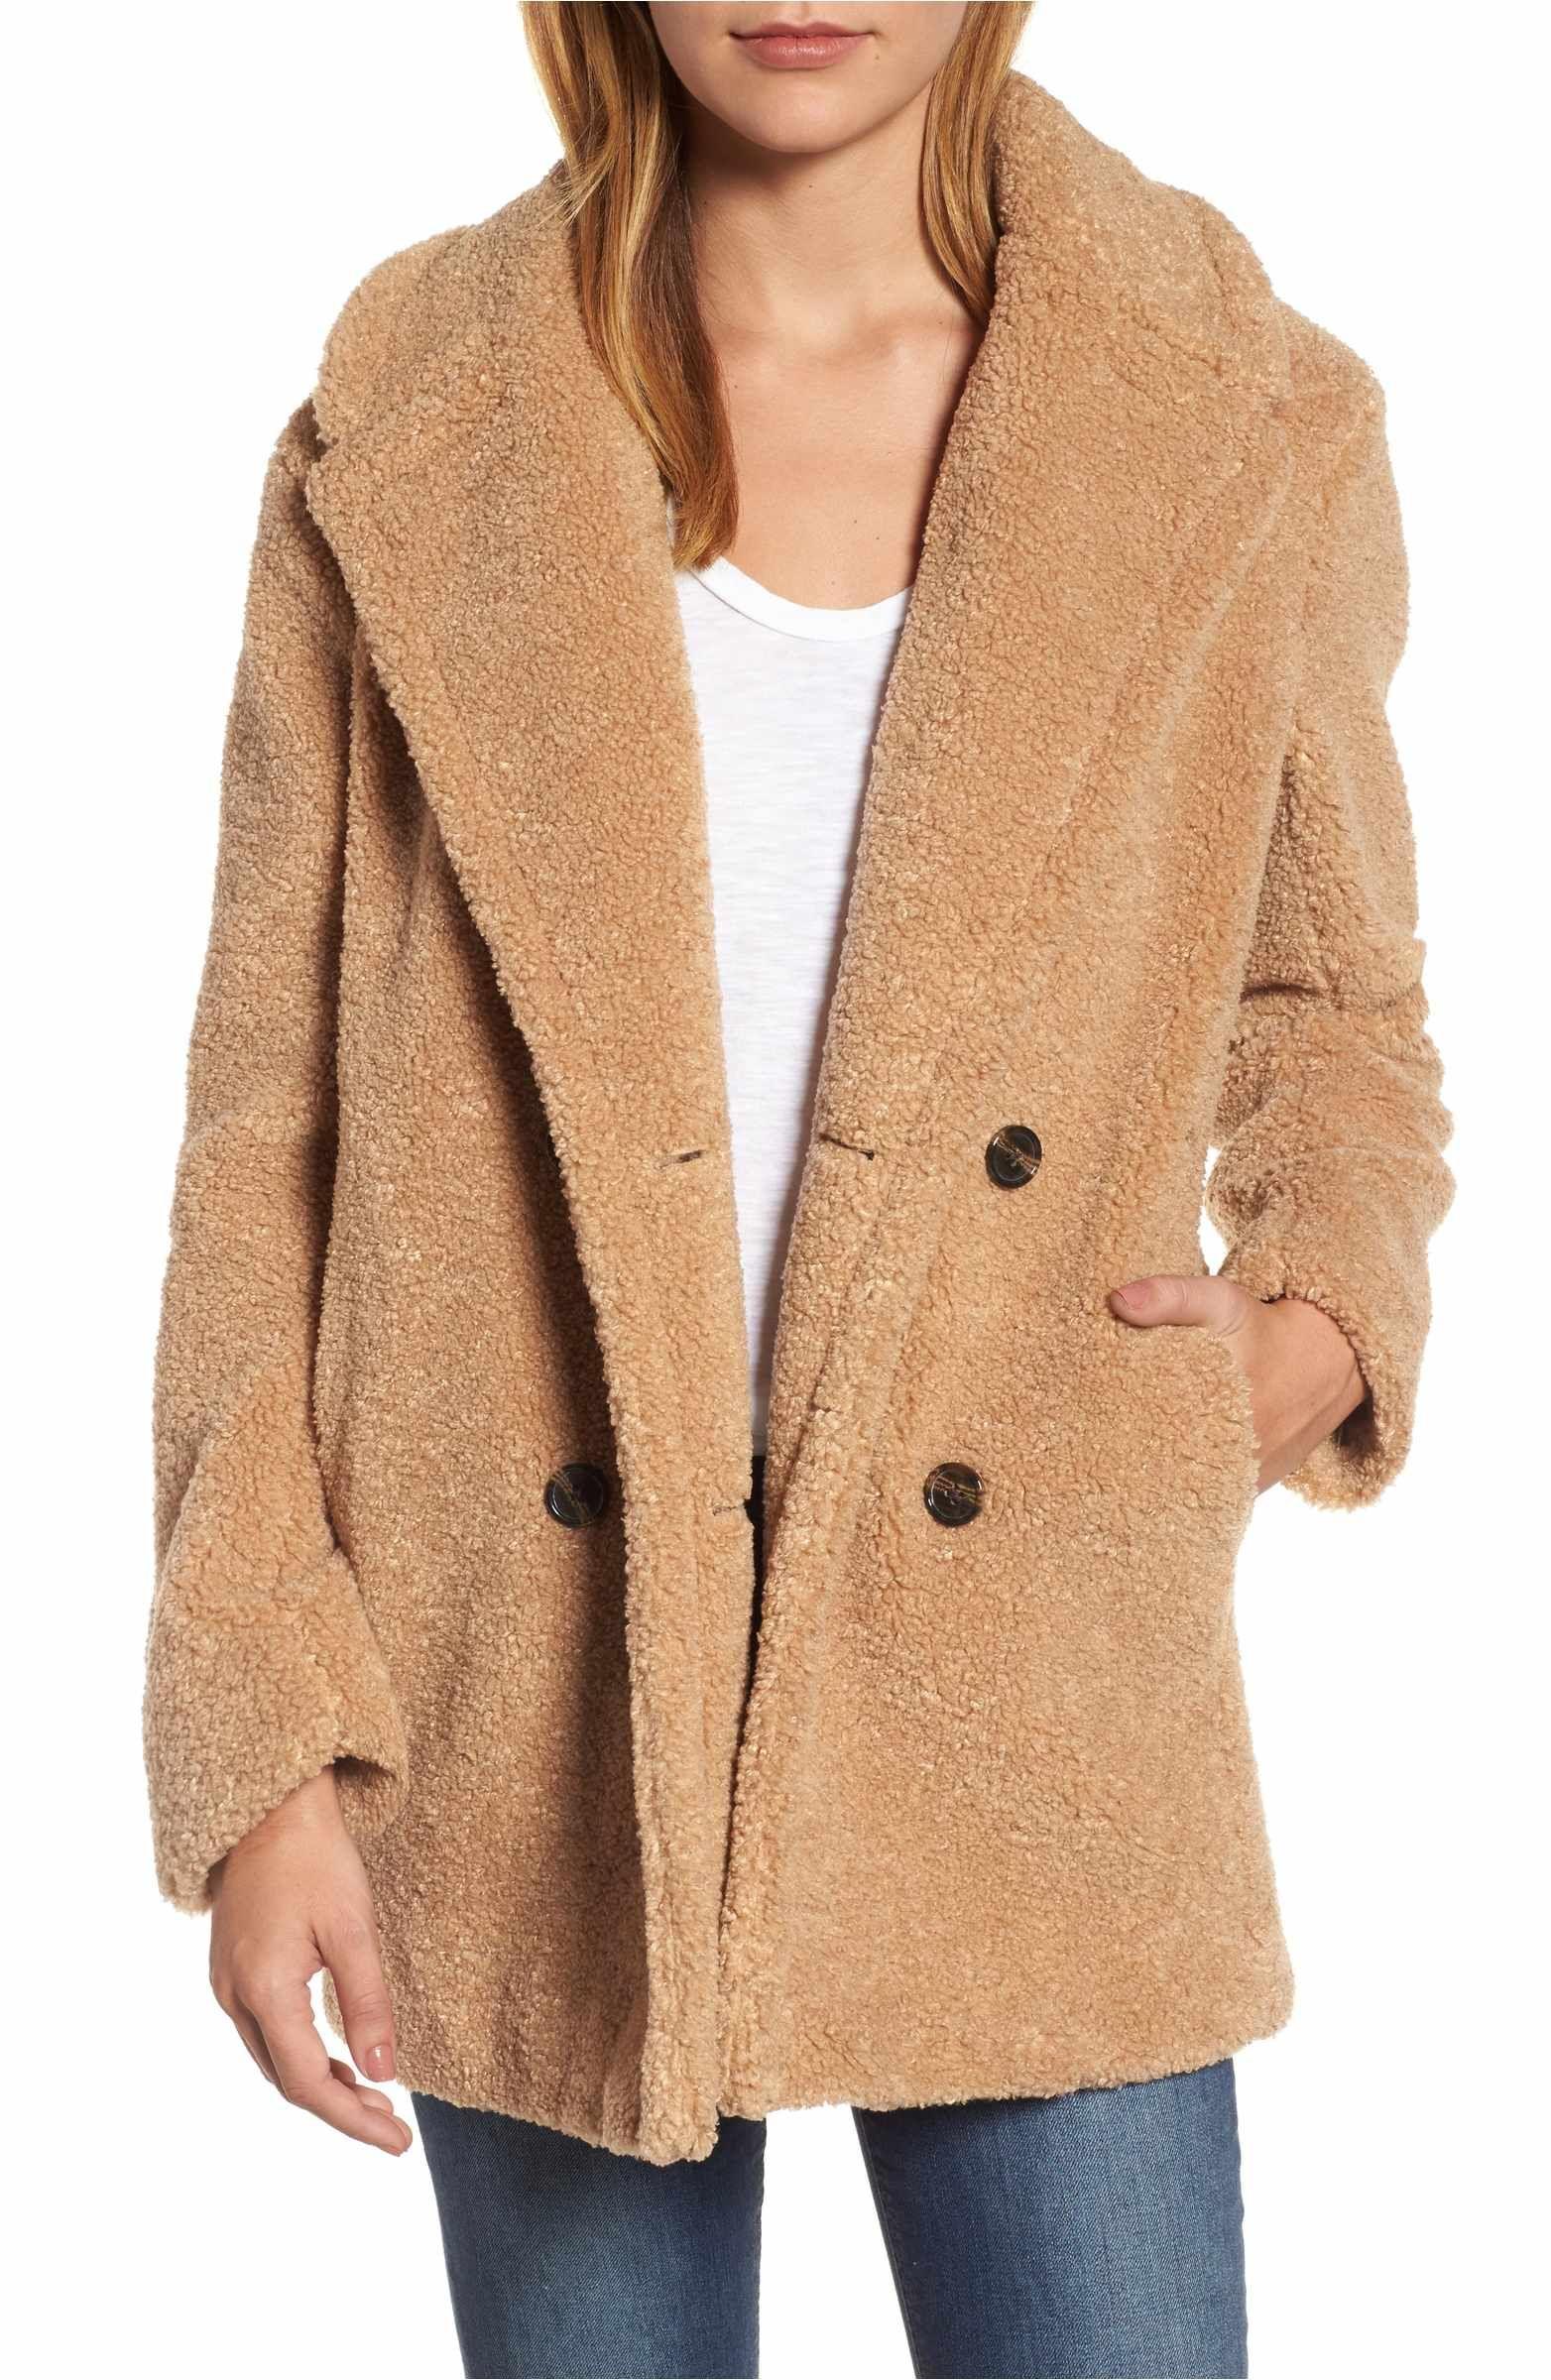 5bbd5de2568 Main Image - kensie Teddy Bear Notch Collar Faux Fur Coat size medium